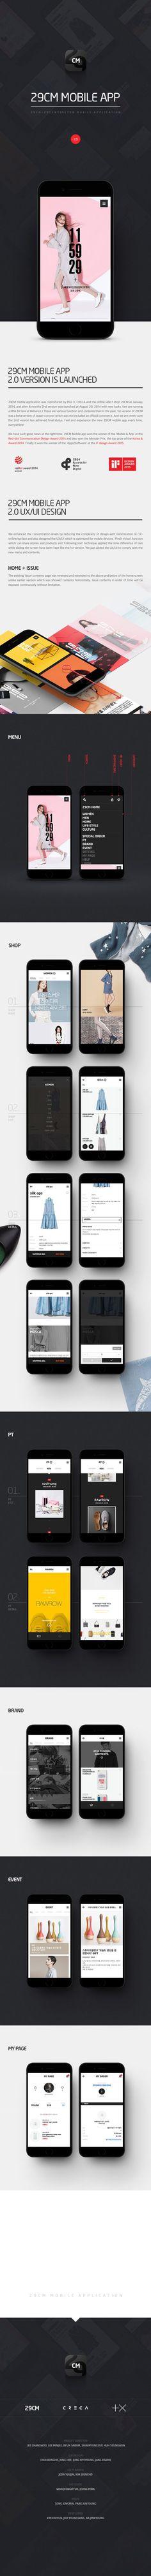 29CM Mobile E-Commerce Fashion App UI Design /// Designed by PlusX  /// PlusX Website_ http://www.plus-ex.com/ Brand Xperience Designer Blog_http://www.shind.me/: